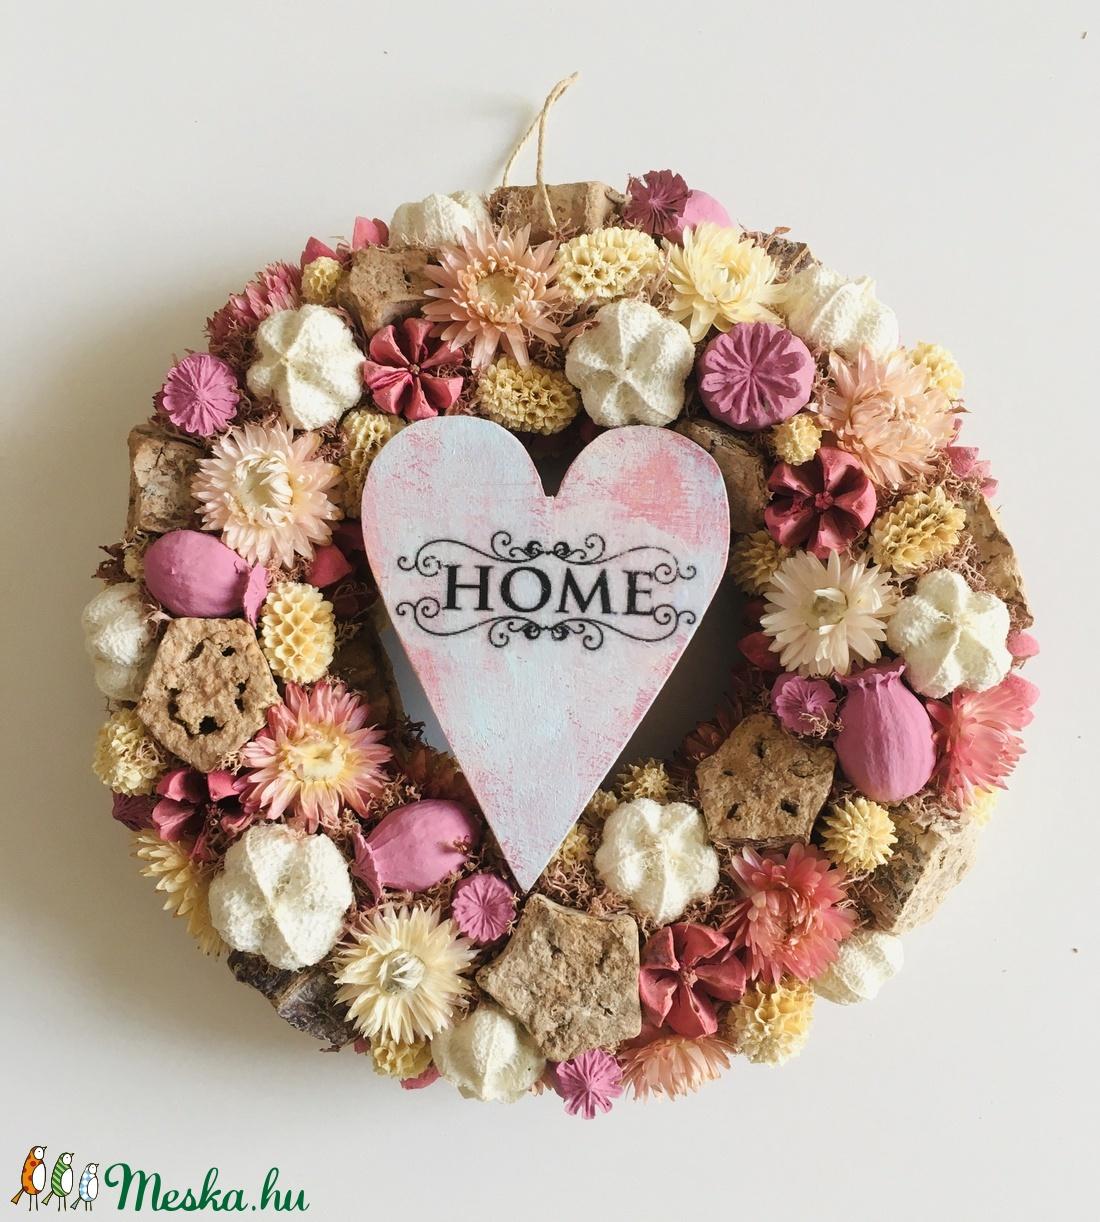 Home sweet home (Fiorista) - Meska.hu